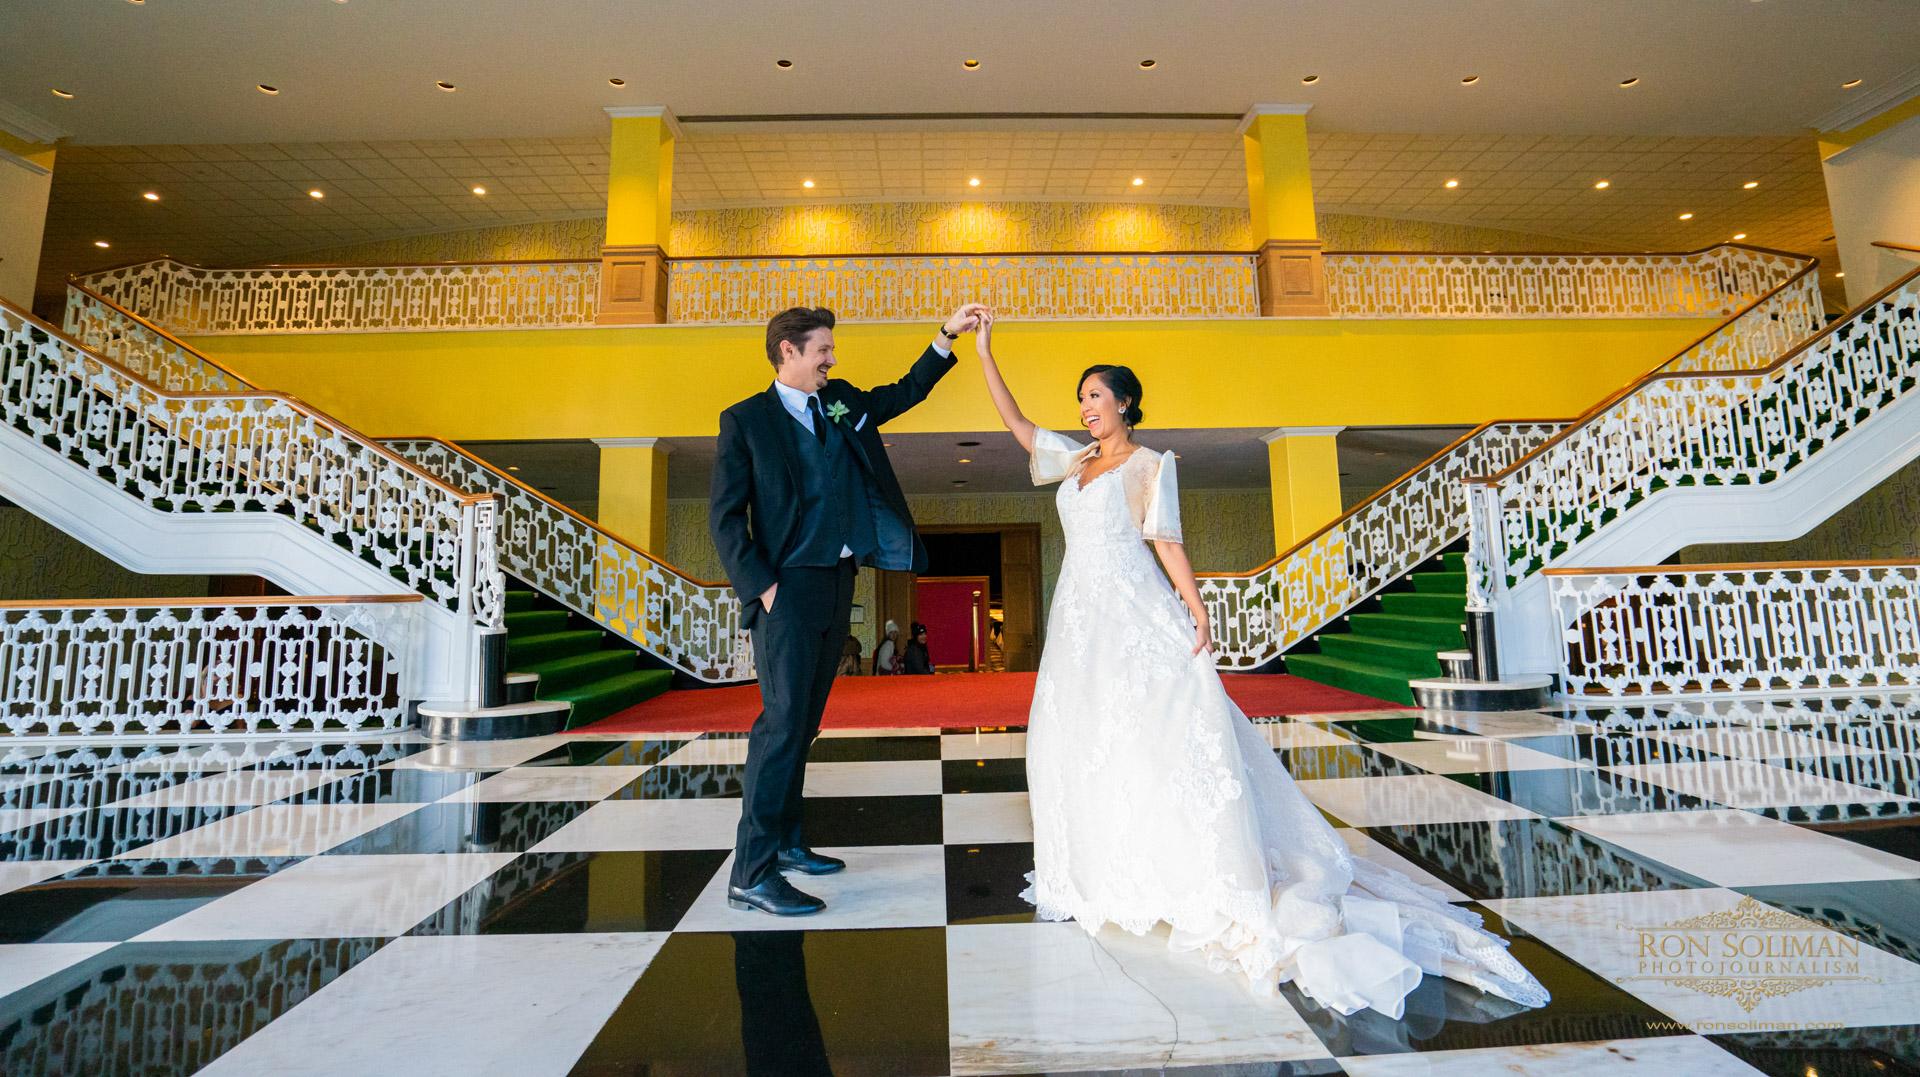 THE GREENBRIER RESORT WEDDING 19